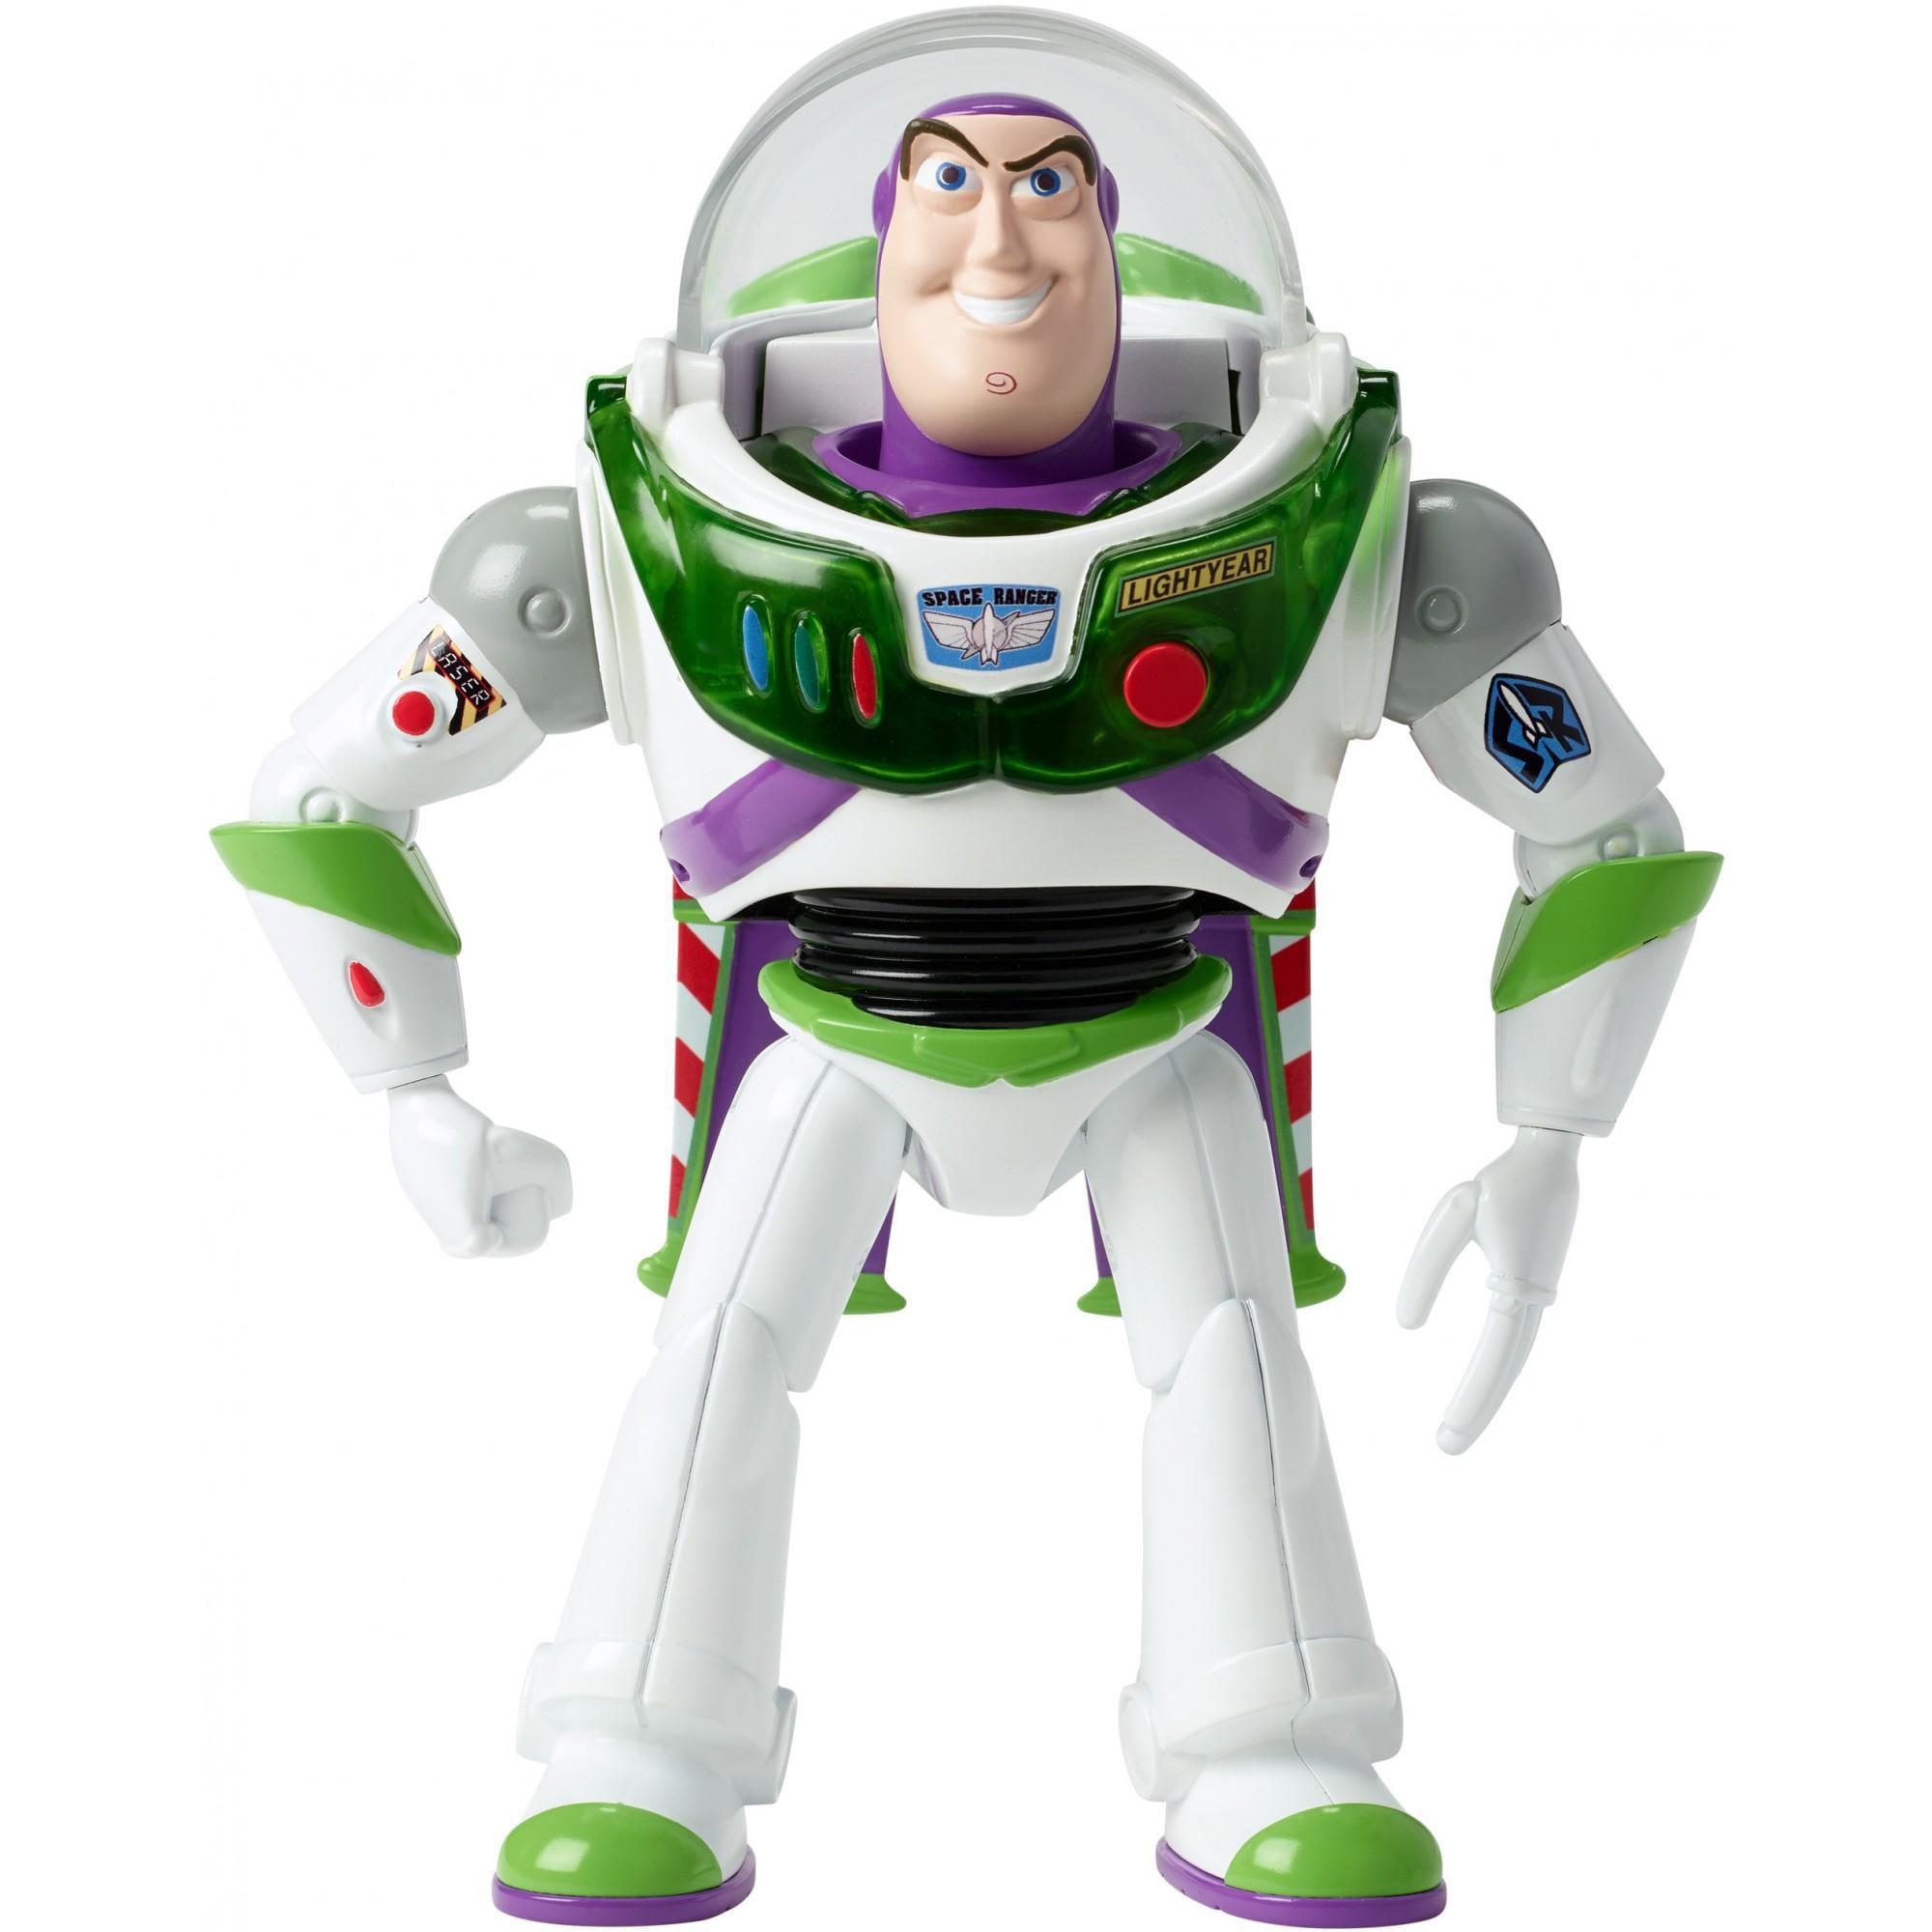 "Disney Pixar Toy Story Blast-Off Buzz Lightyear 7"" Figure"